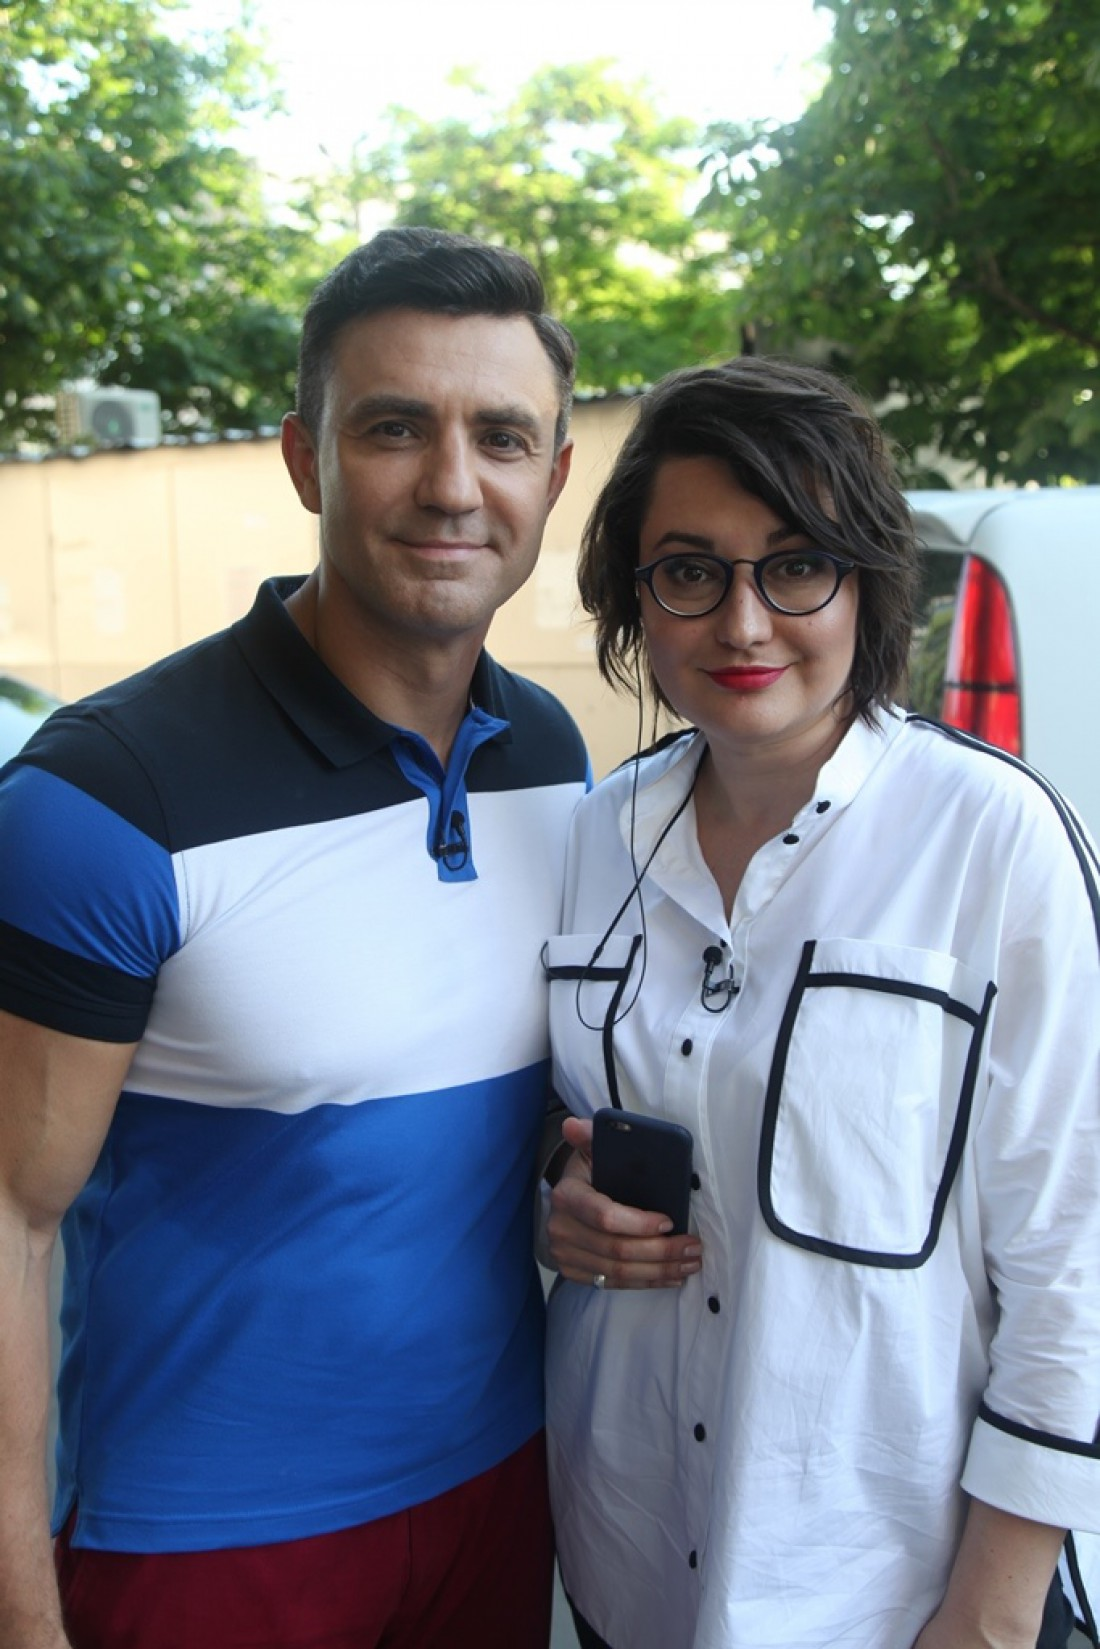 Николай Тищенко и Анна Жижа